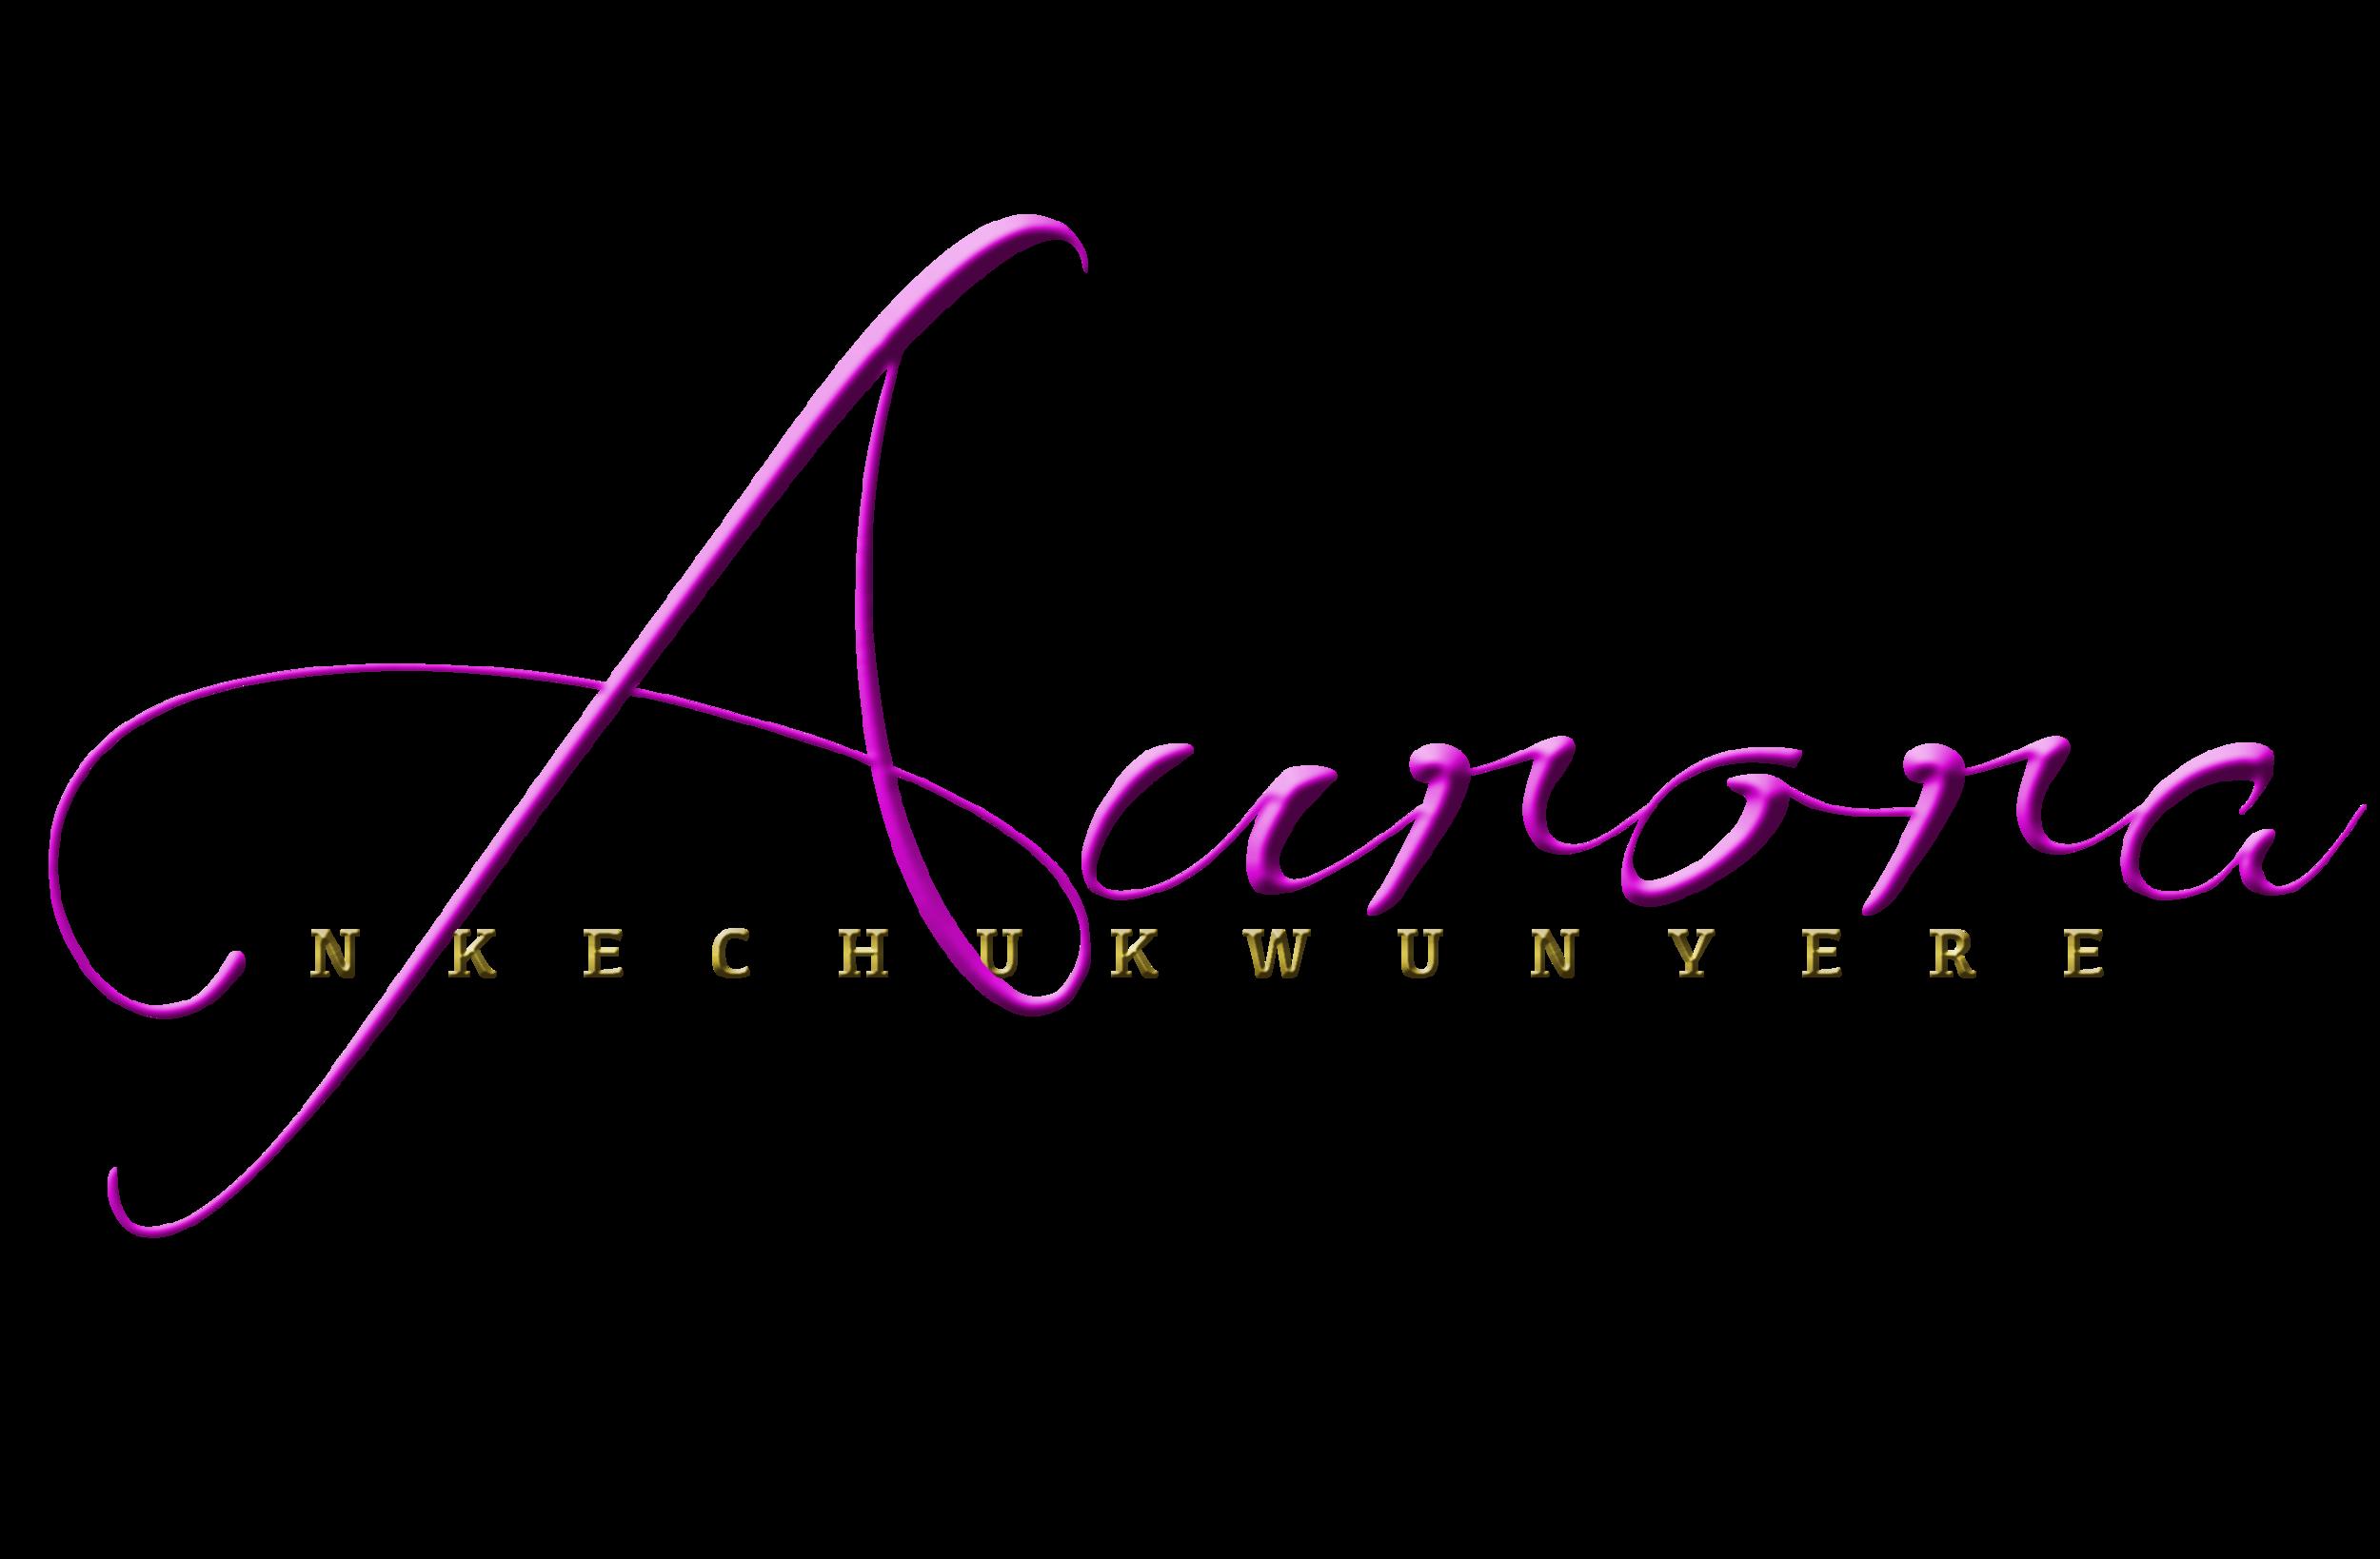 AURORA LIFESTYLE LOGO [CONSERVATIVE]